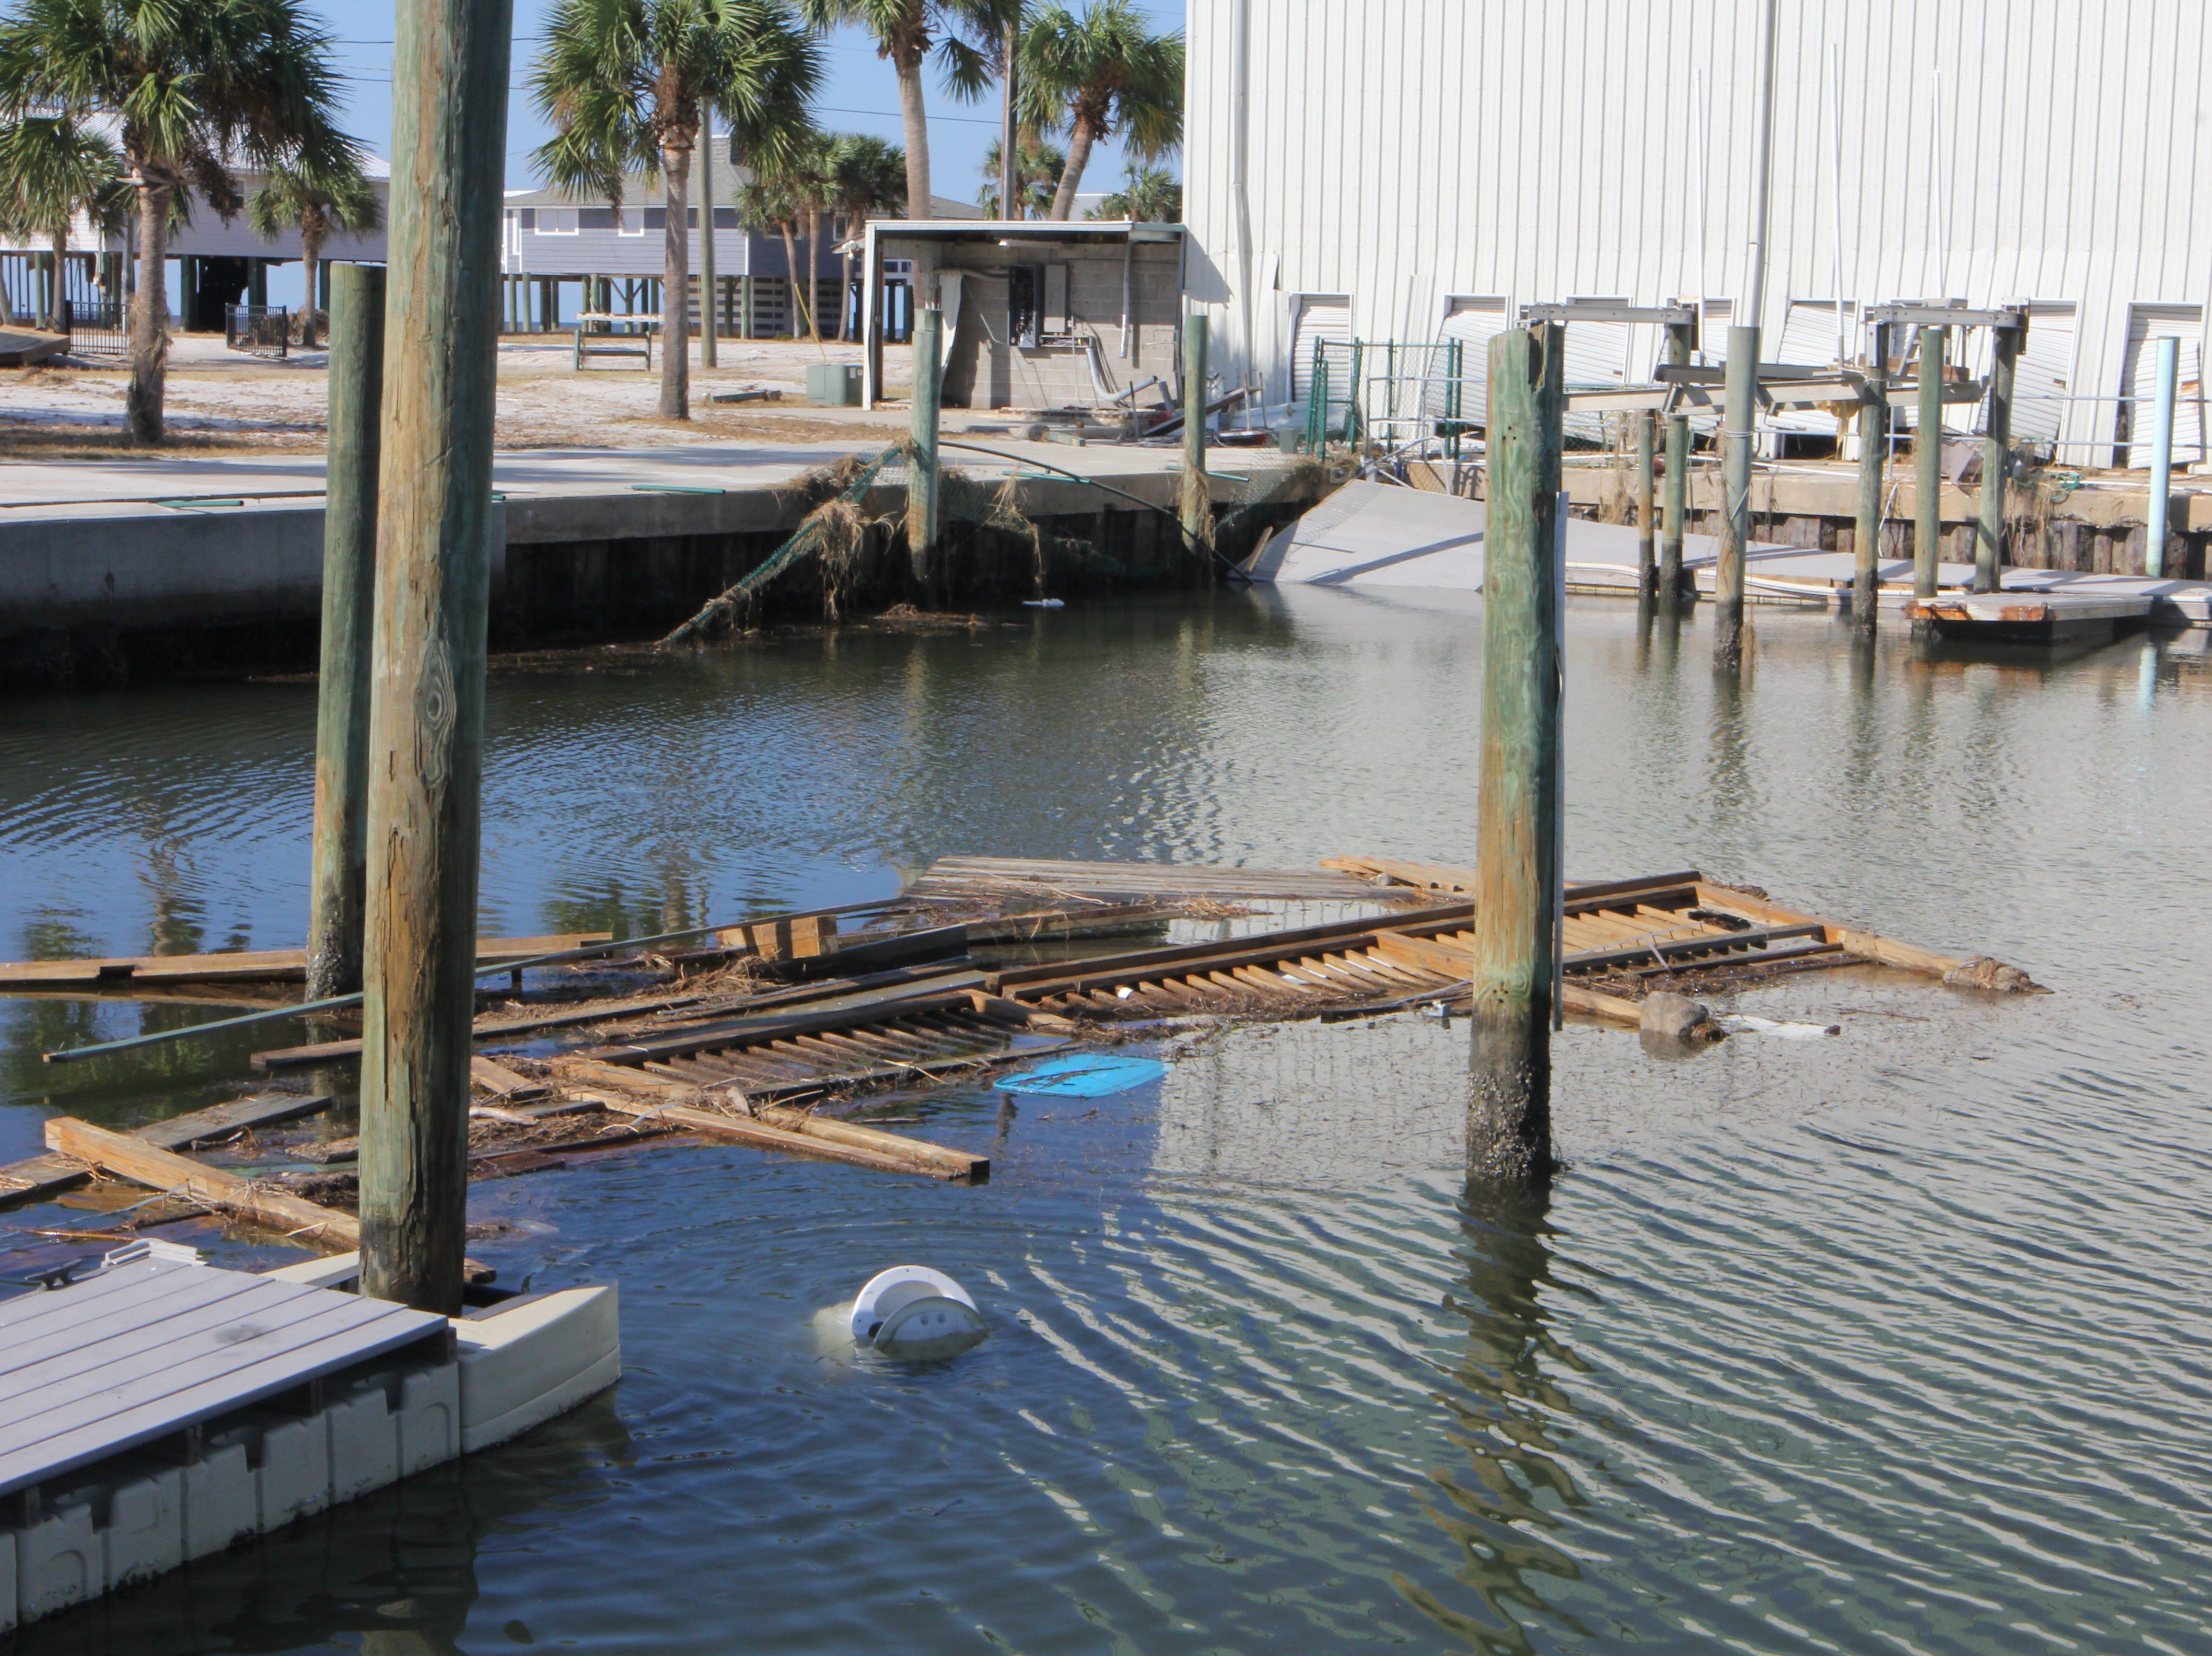 Debris floats in Alligator Point Marina after Hurricane Michael.